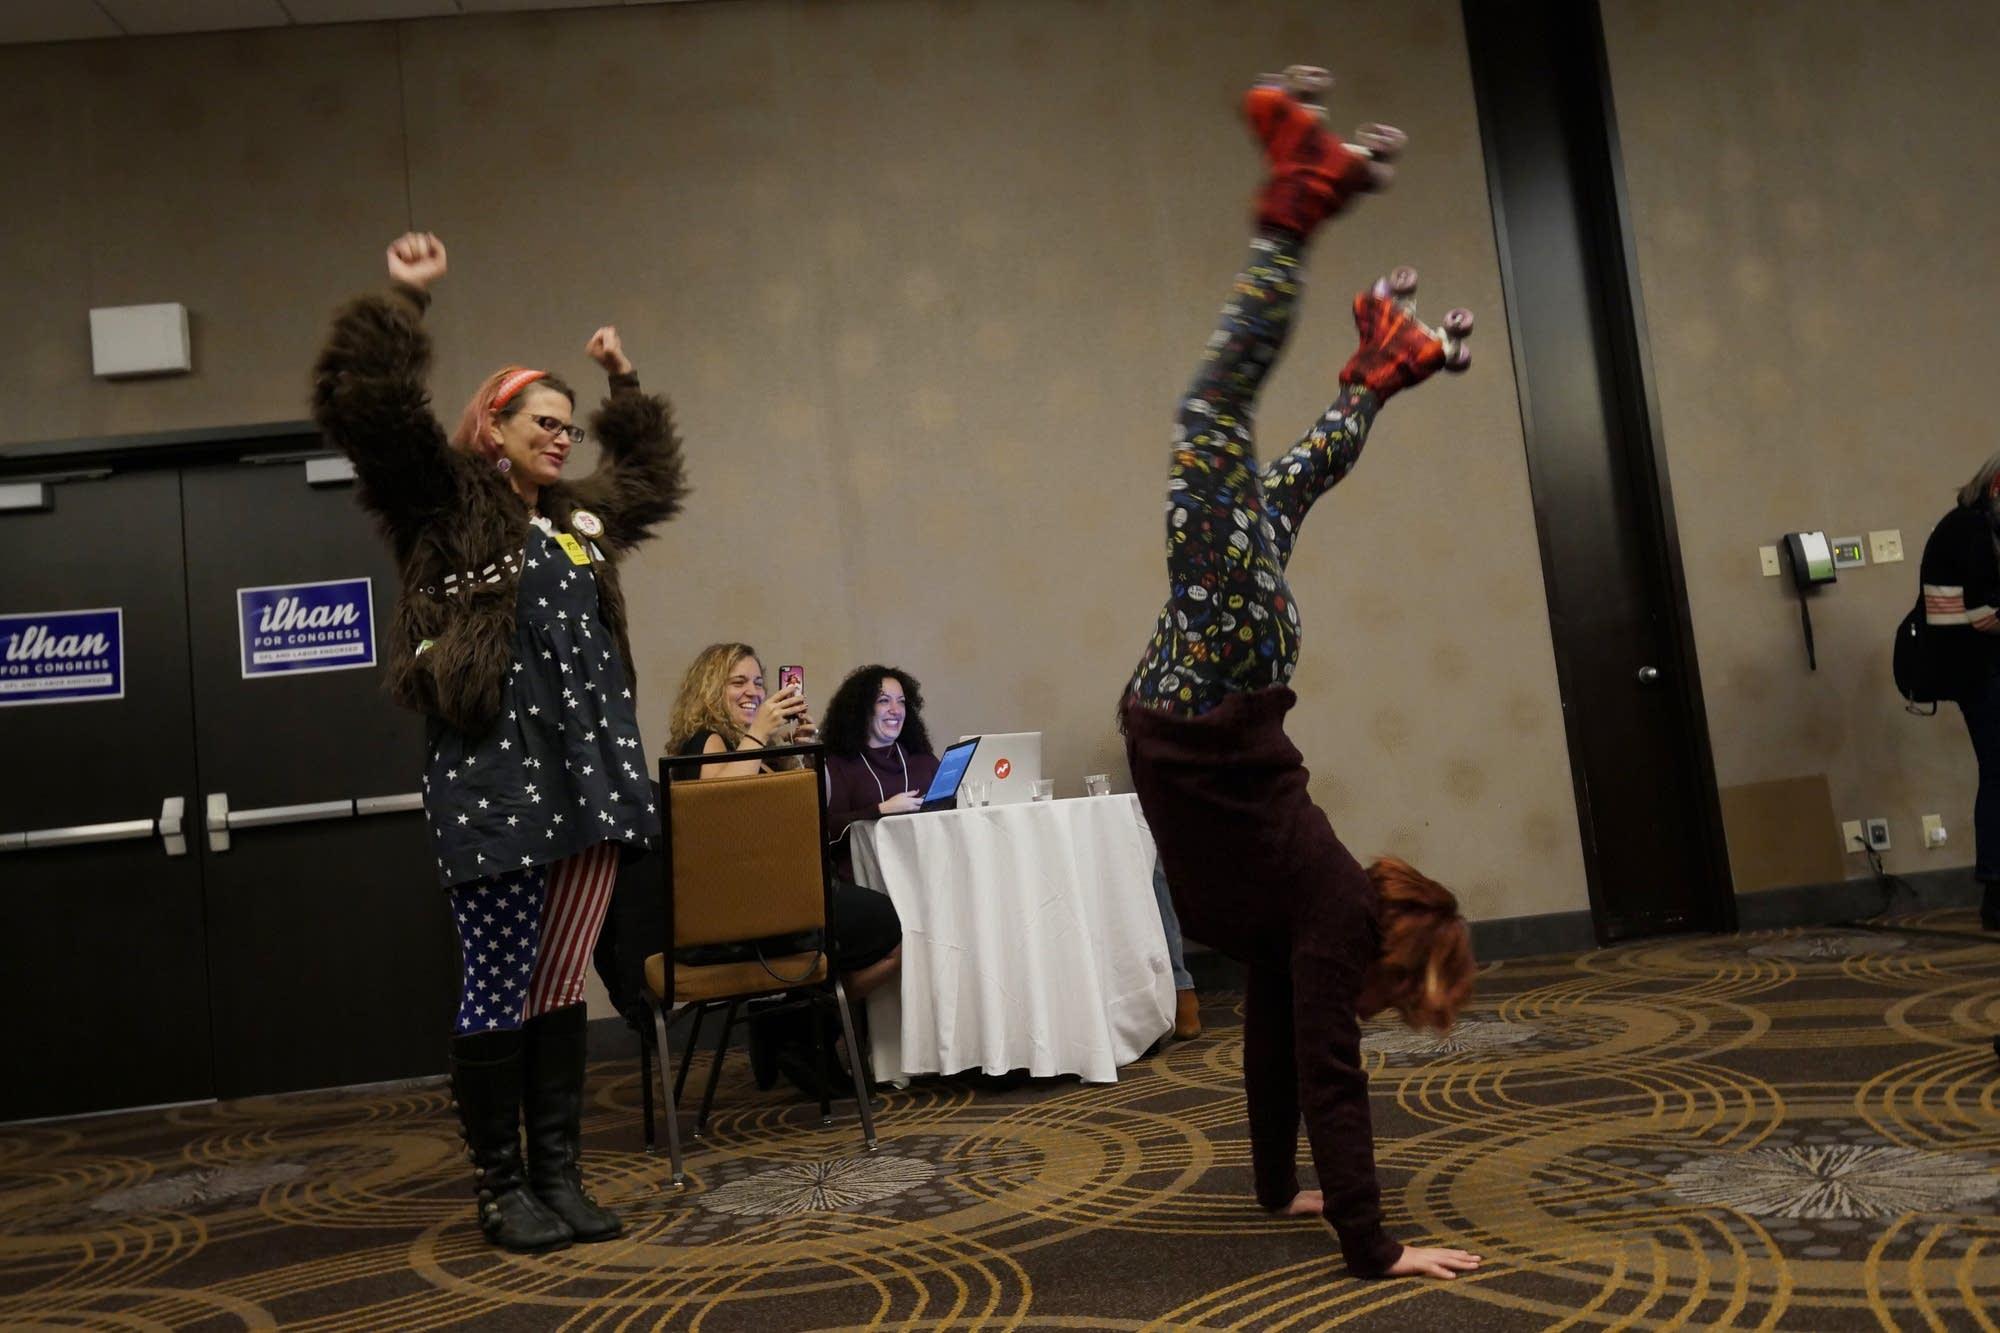 Volunteers Majentah Aquarious and Mina Leierwood entertain themselves.